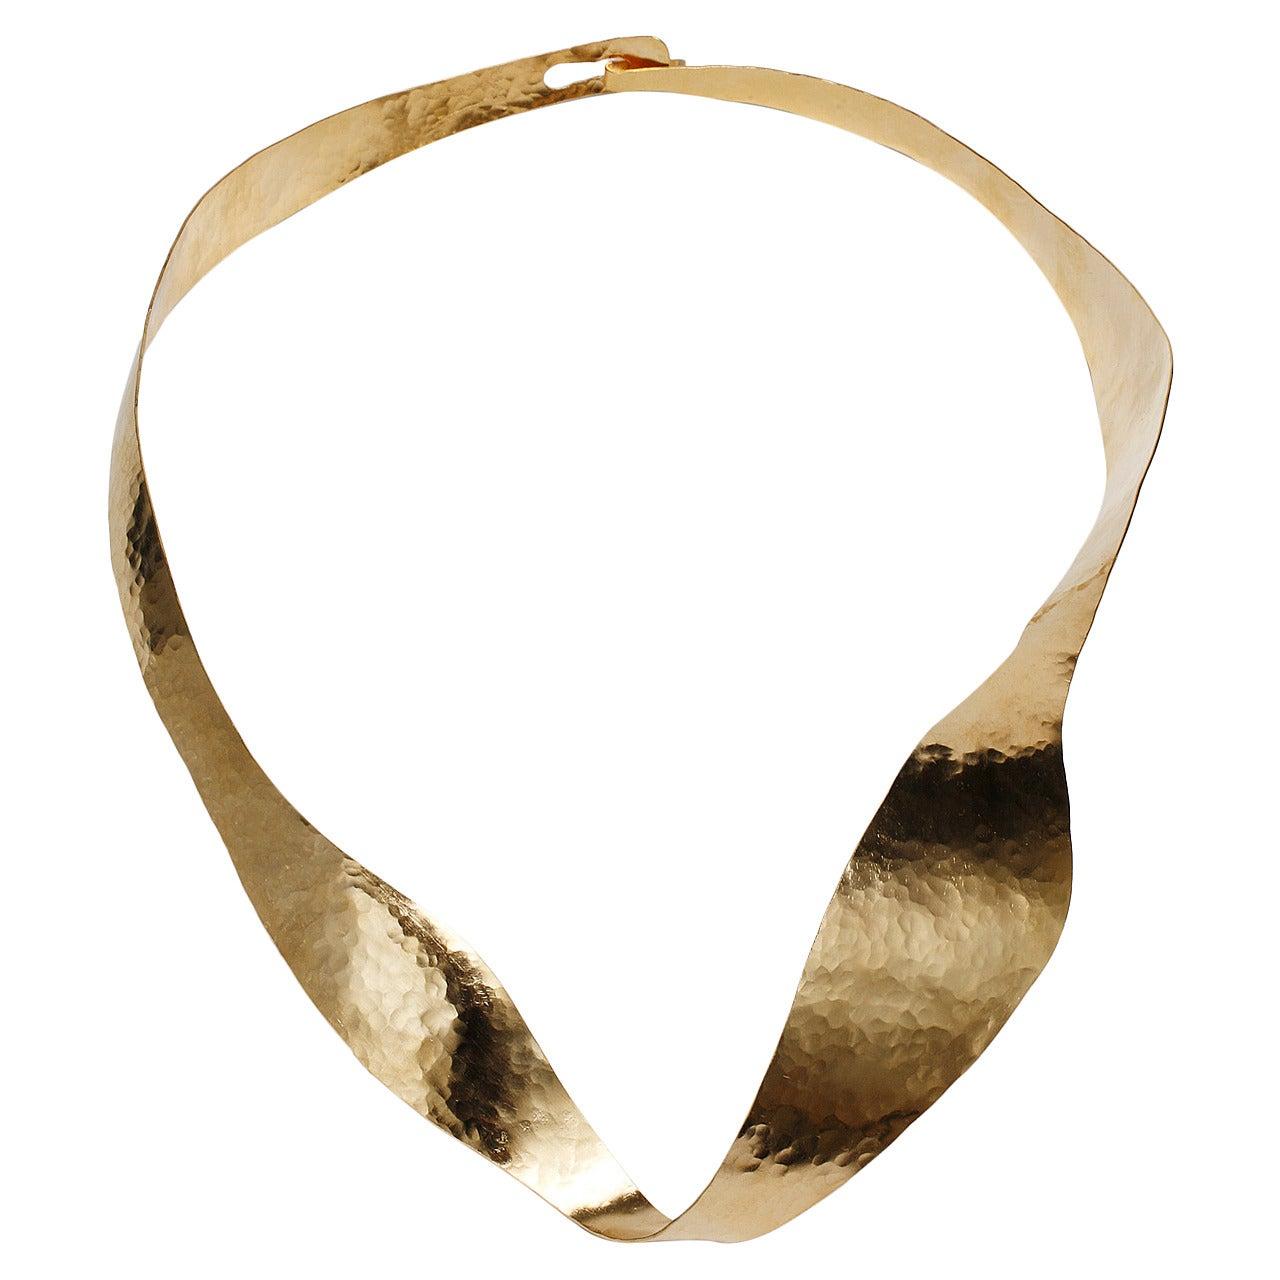 Gold Sculpture Necklace by Jacques Jarrige, 2014